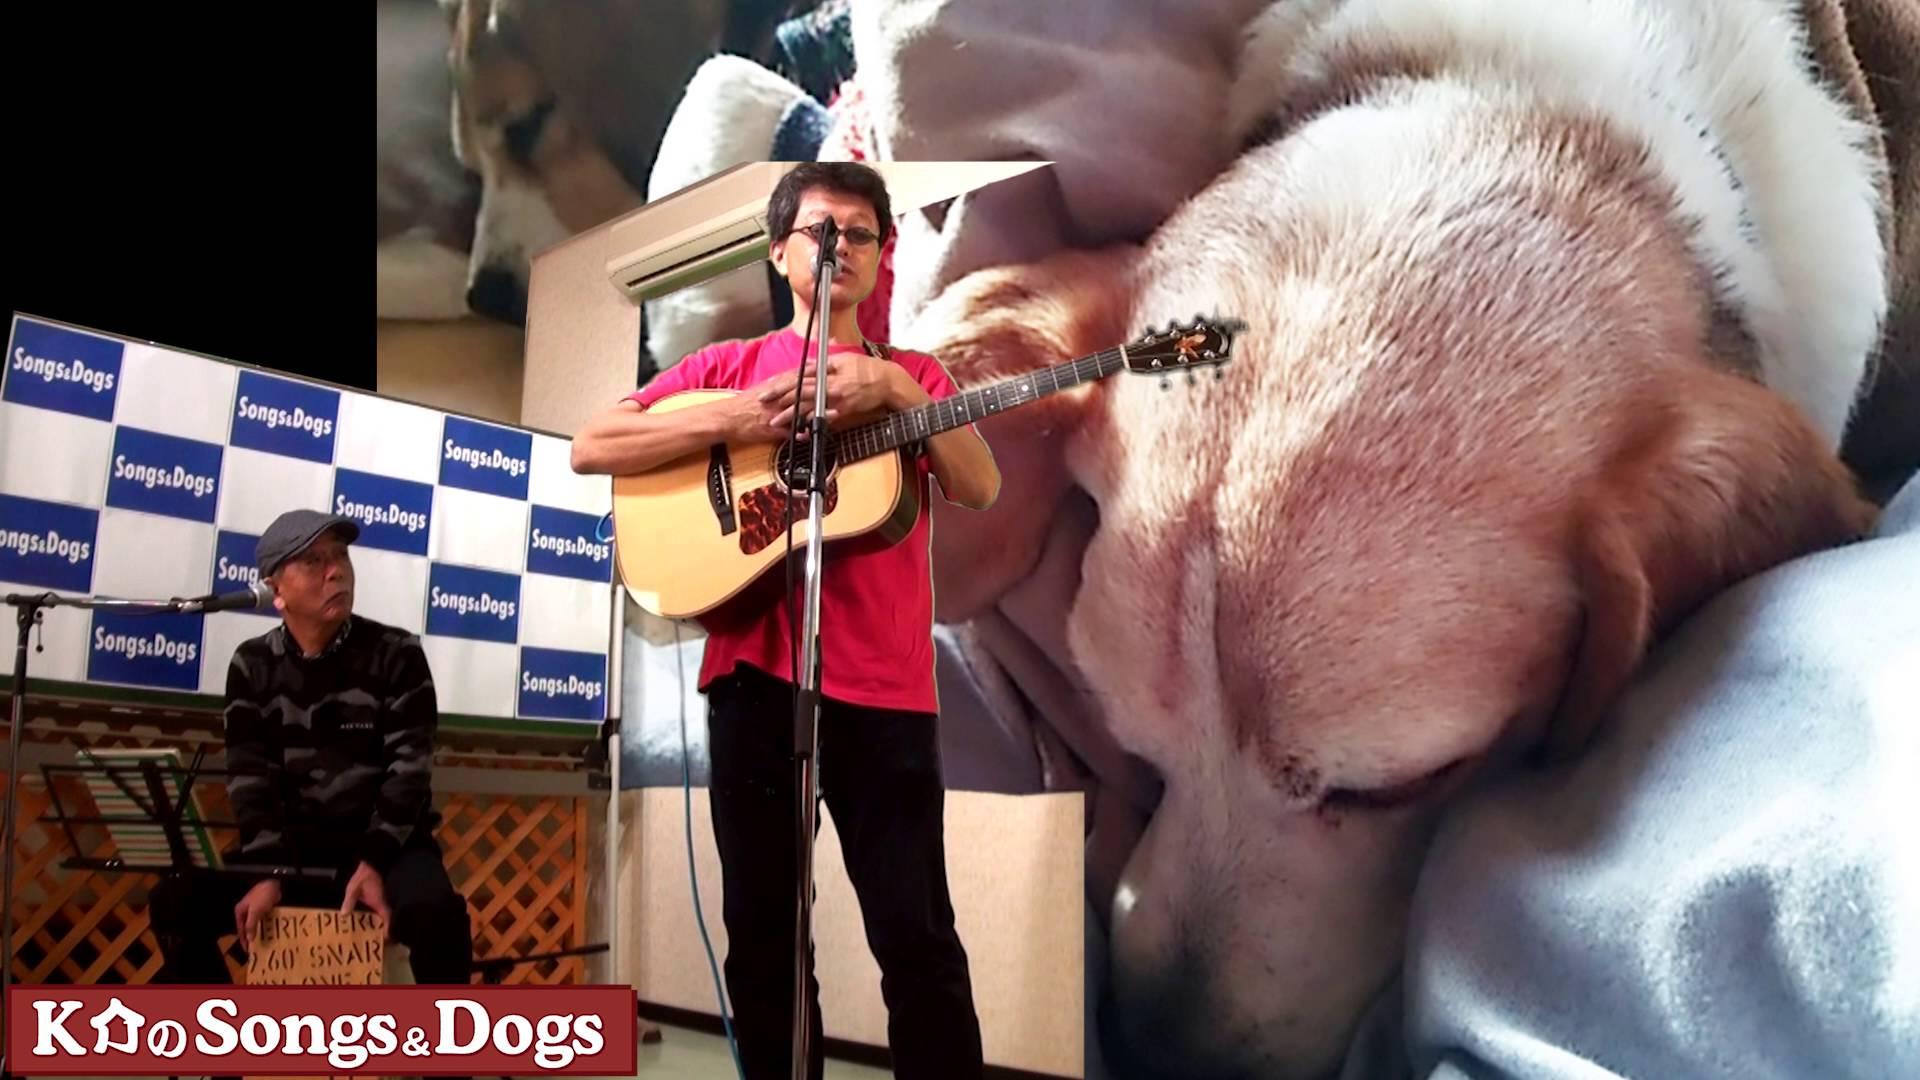 109th: K介のSongs&Dogs週末はミュージシャン